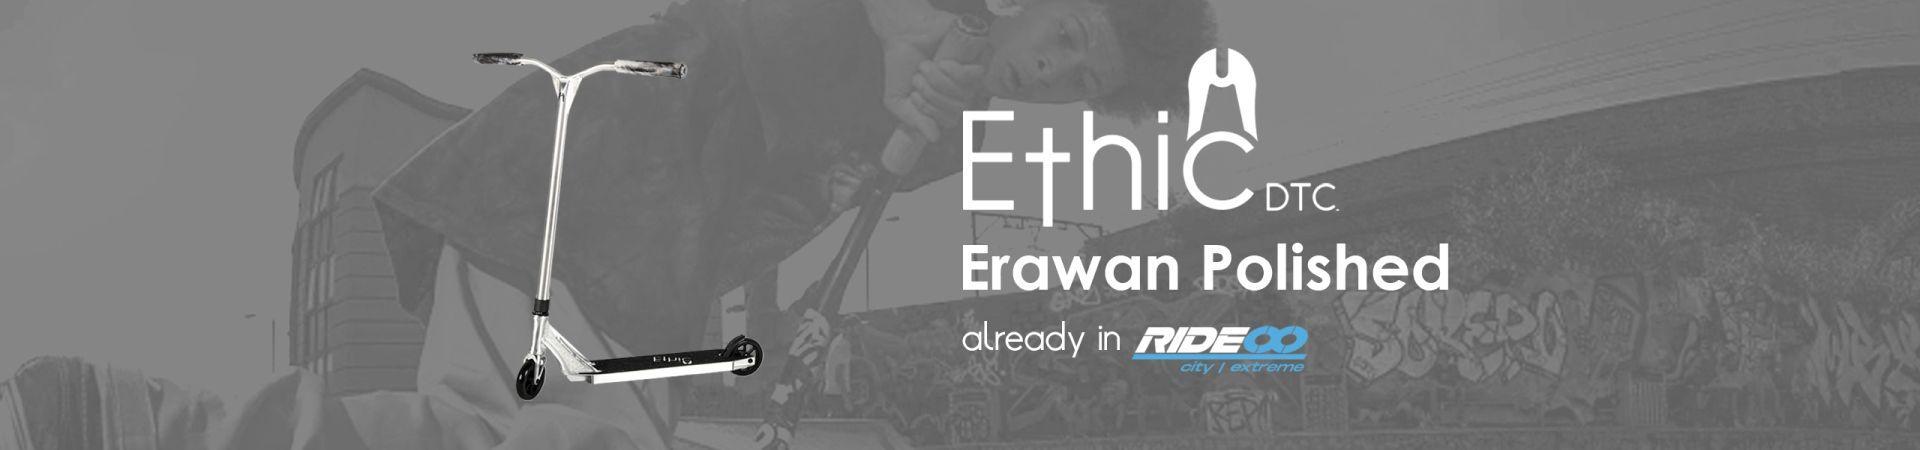 Ethic Erawan